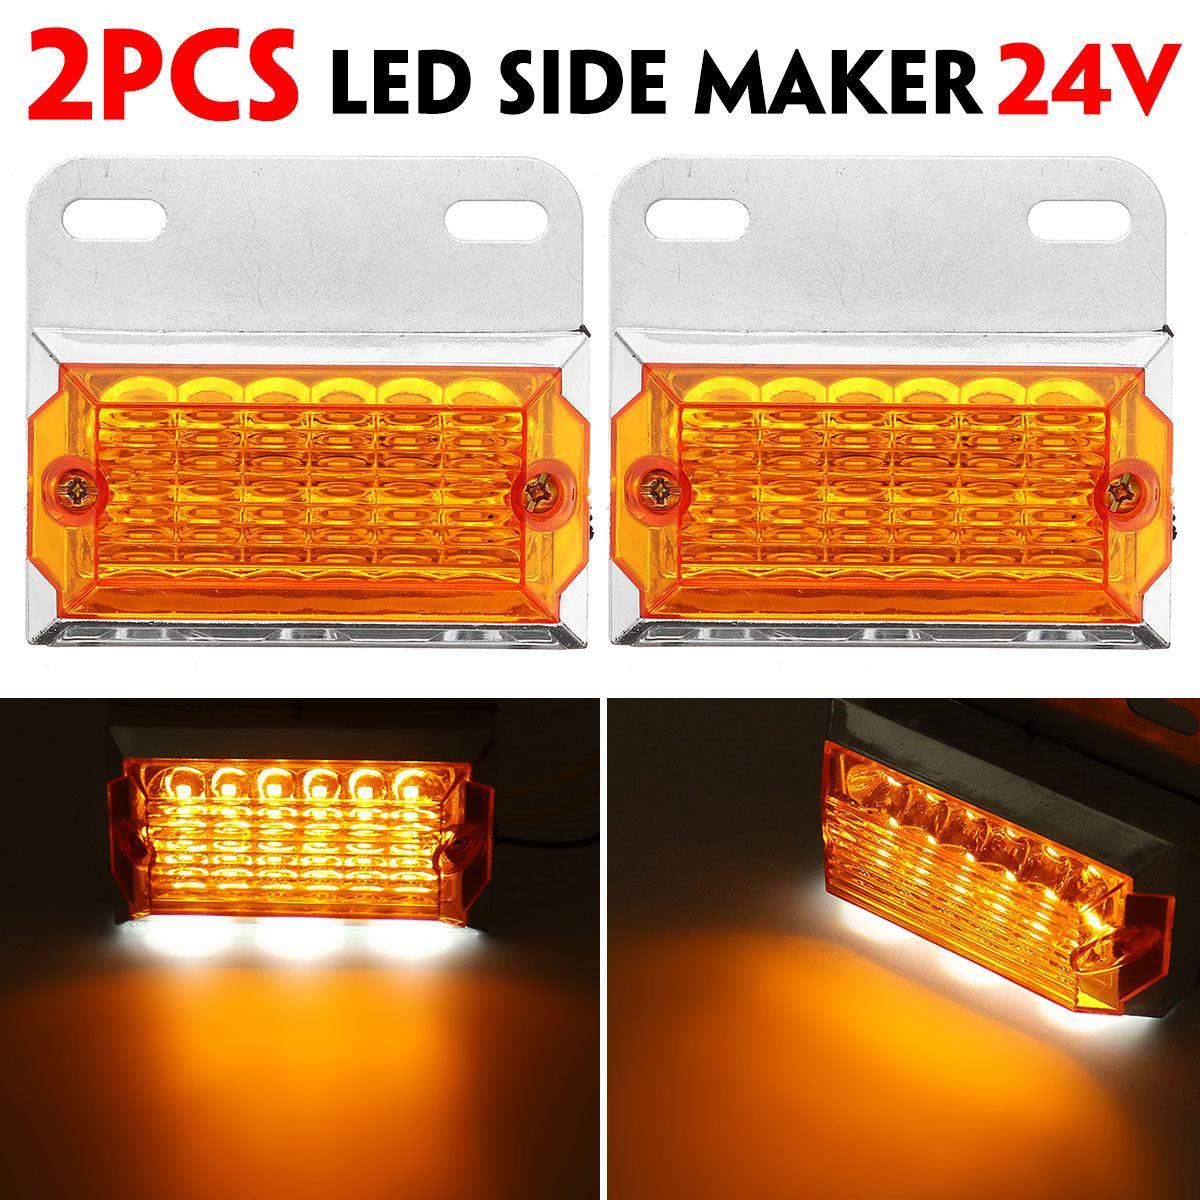 2pcs 24V 15 LED Side Marker Lights Car External Lights Squarde Warning Tail Light Signal Lamps Auto Trailer Truck Lorry Amber